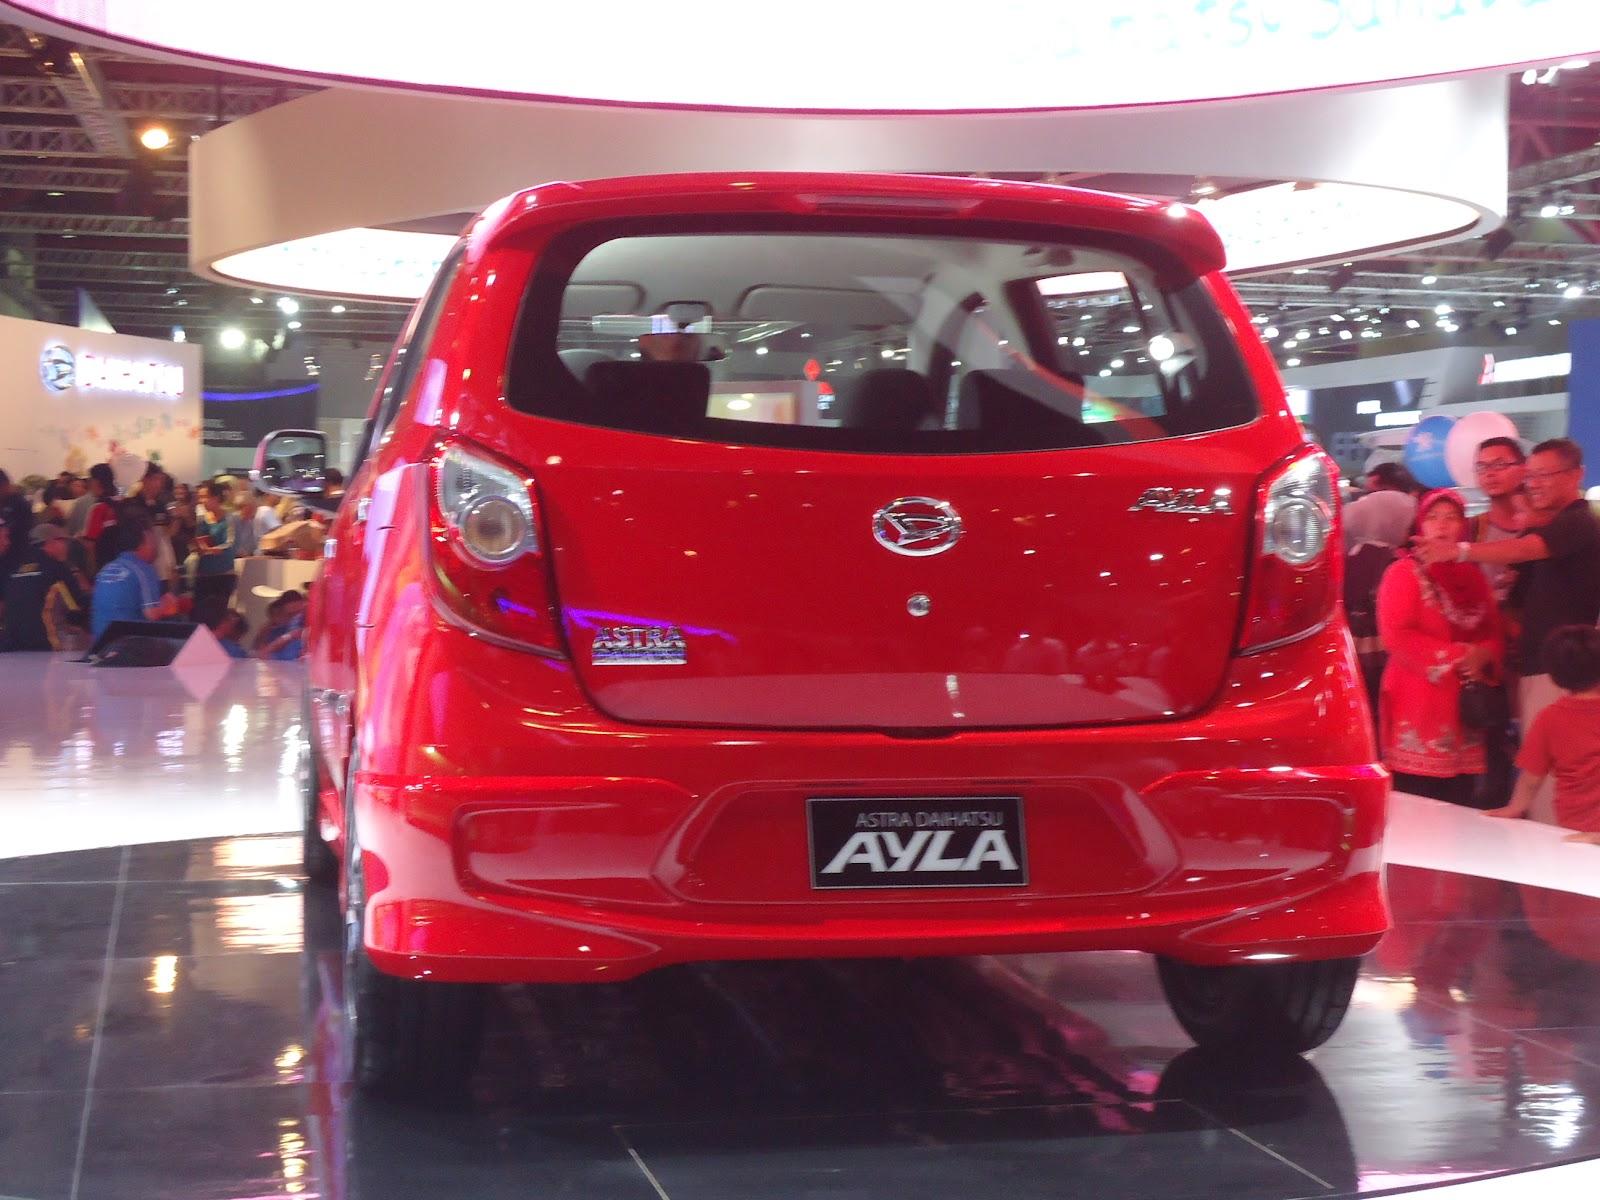 New Agya G Vs Trd Konsumsi Bbm Grand Veloz Herwono Banyu Alas Mobil Murah Toyota Dan Daihatsu